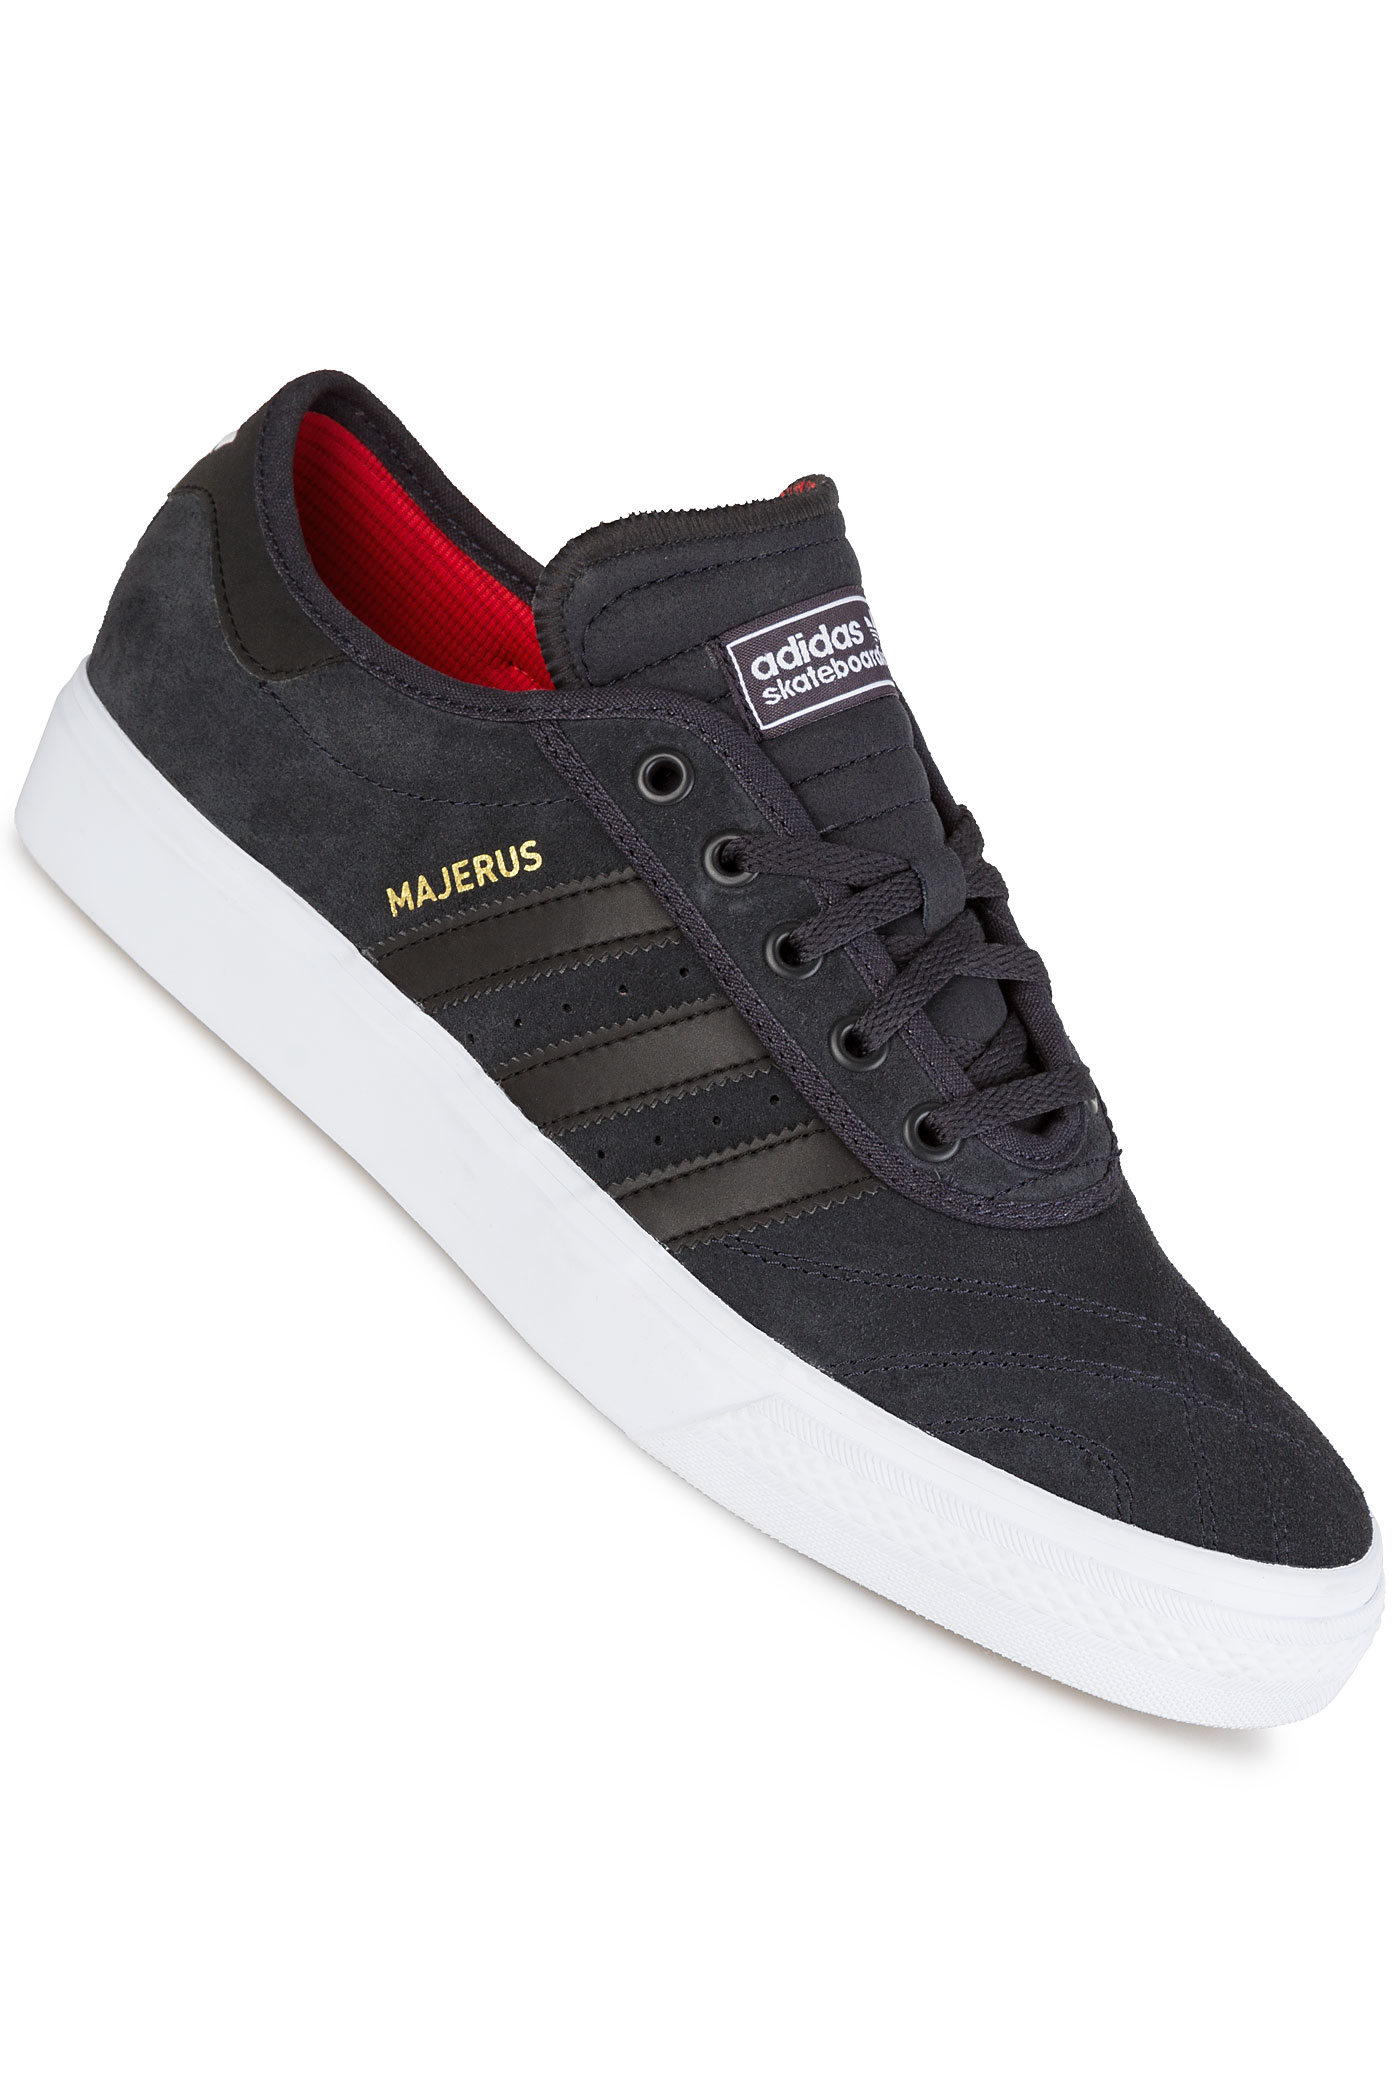 Adidas Adi Ease Premiere Adv Skate Shoes